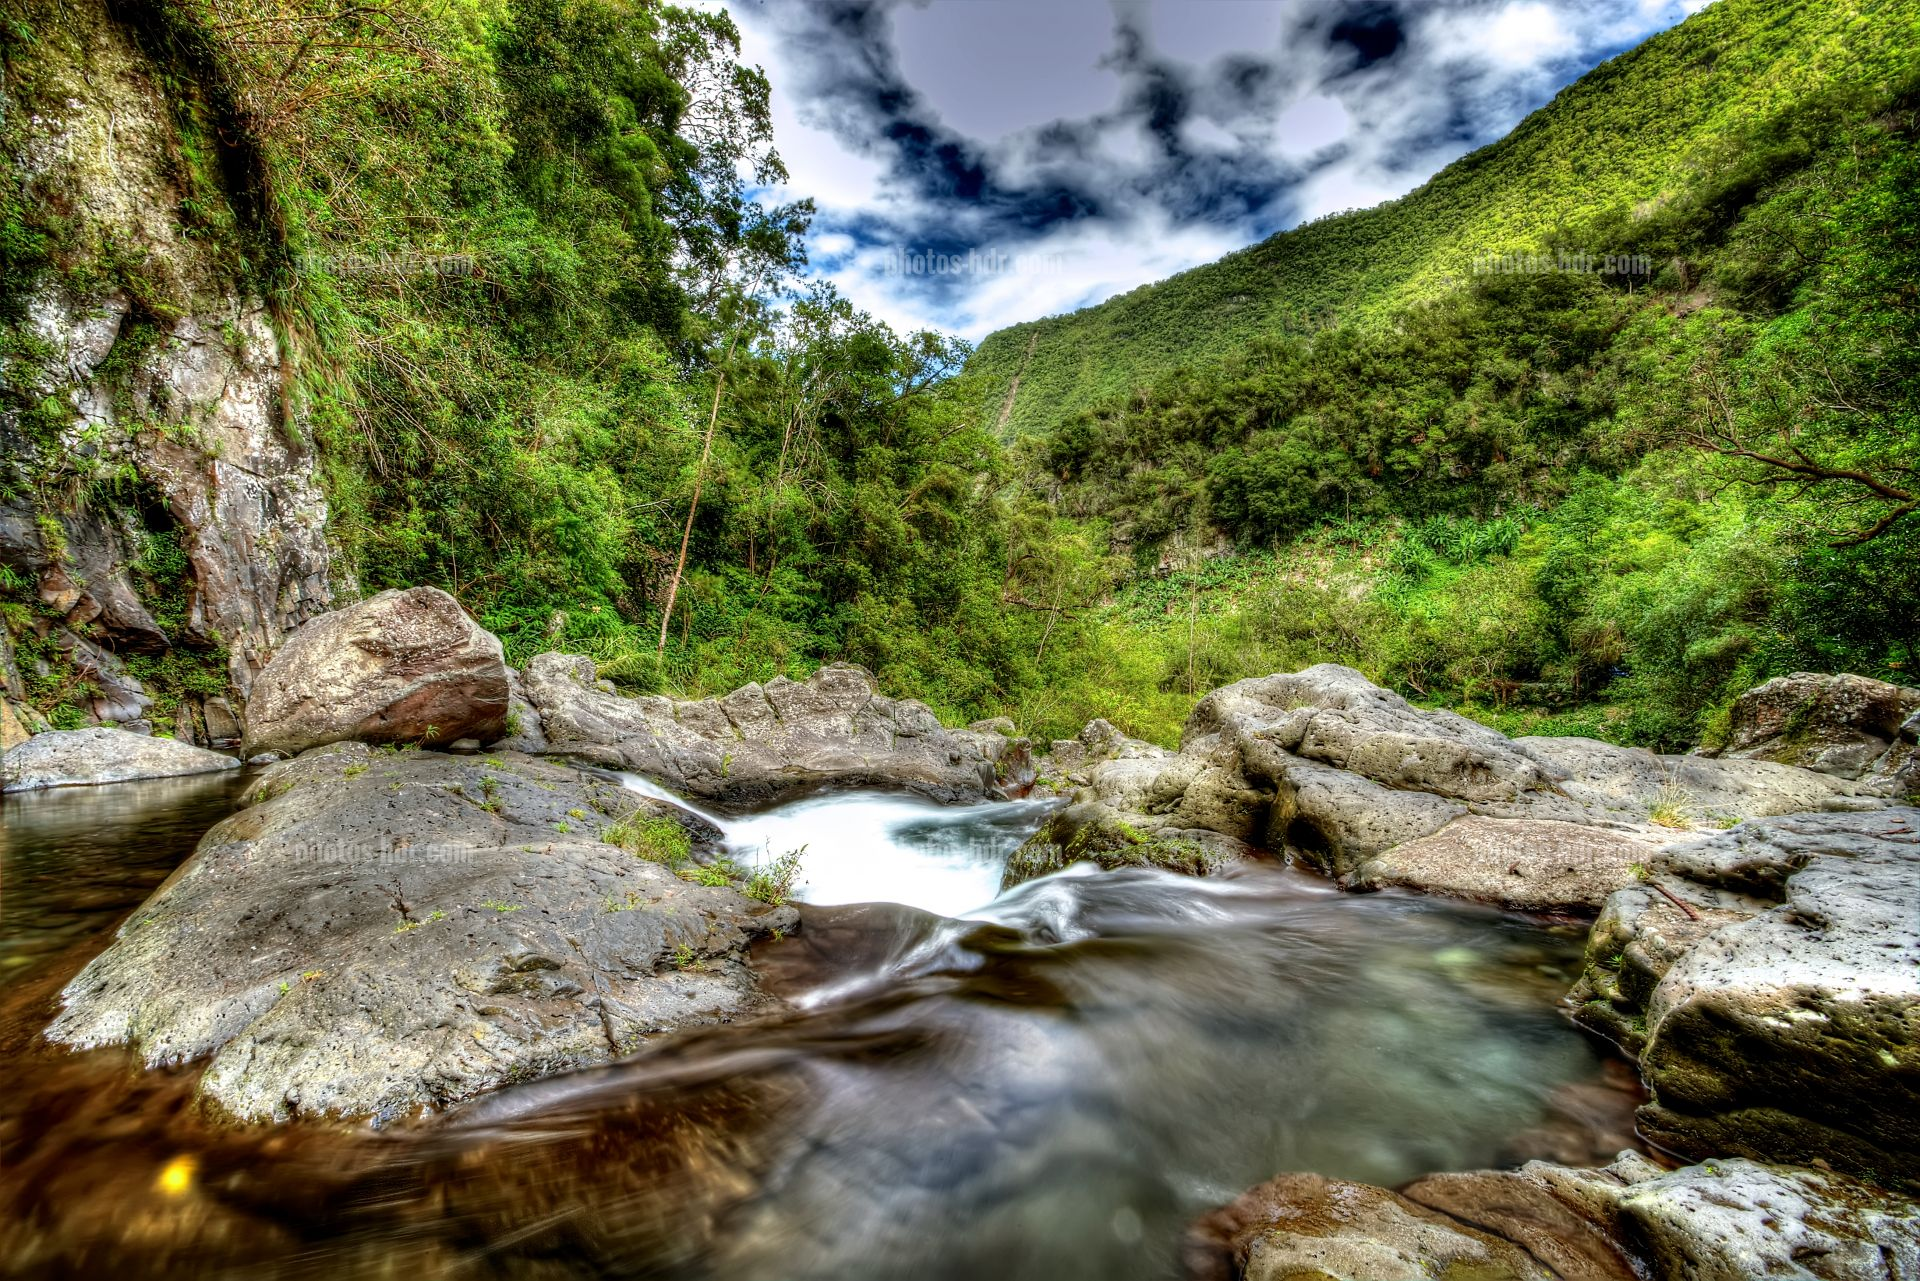 Photos hdr langevin photo langevin - Galet de riviere ...